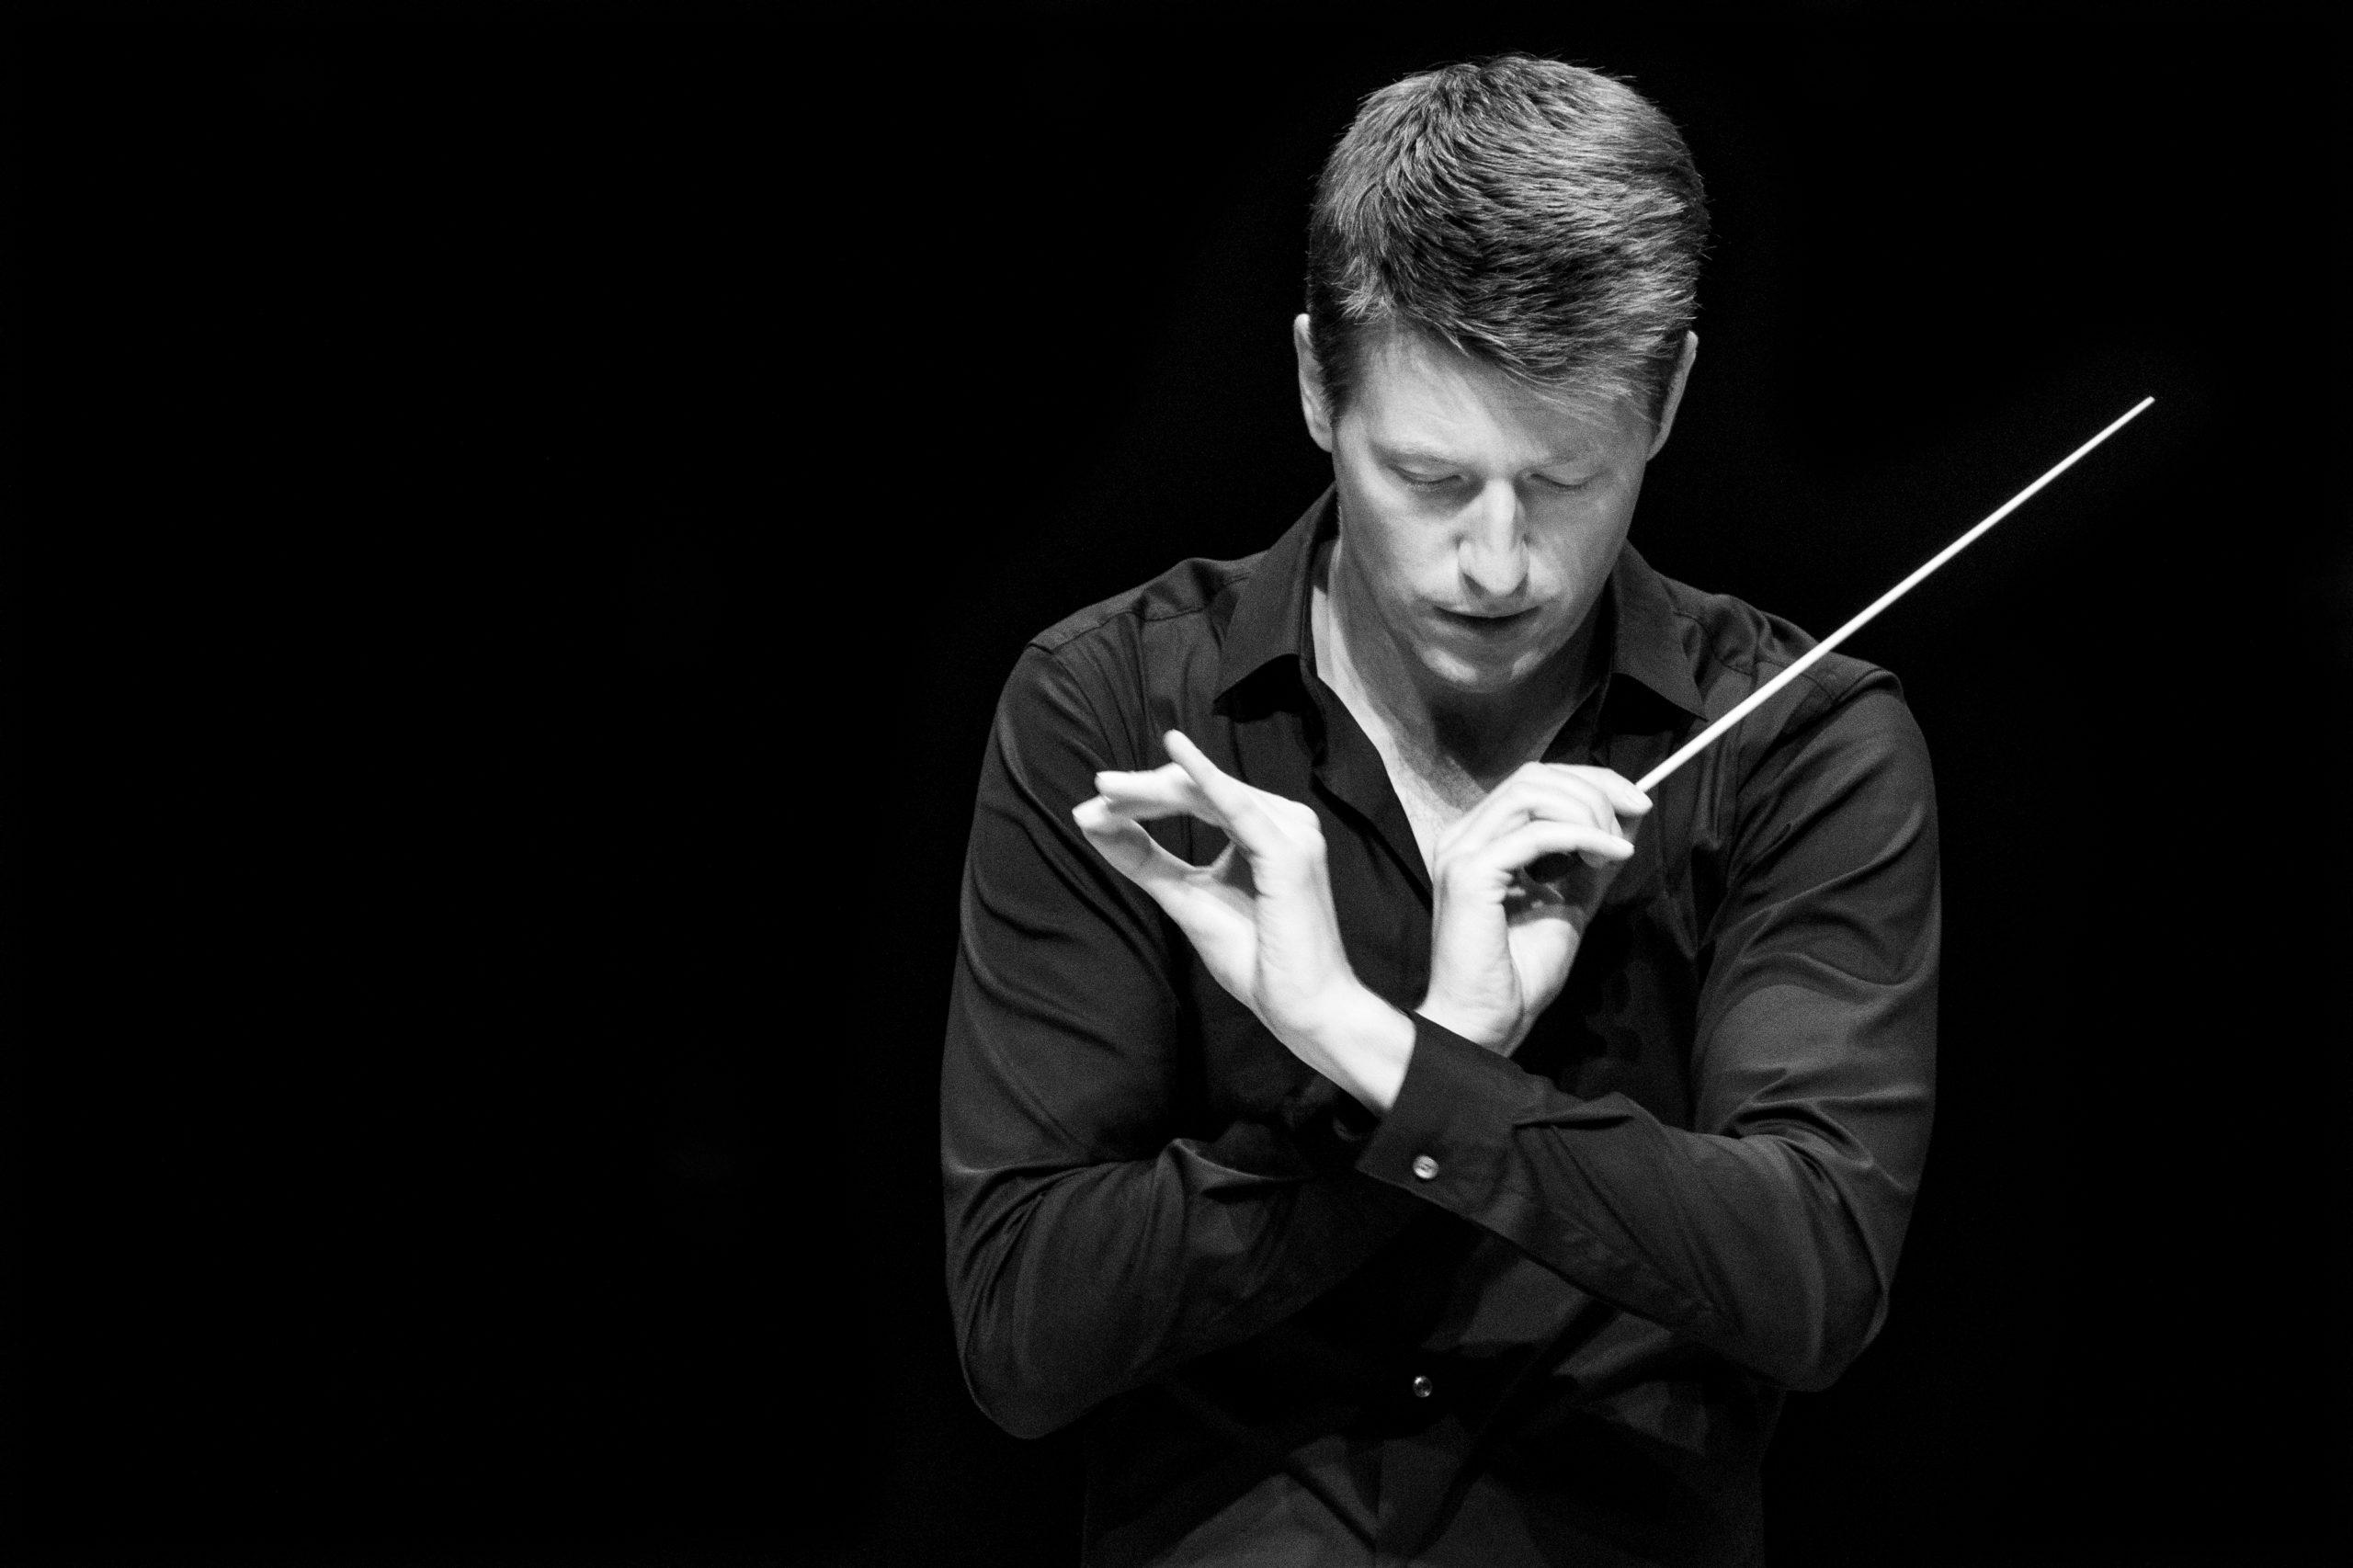 Duncan Ward conductor music artist baton podium